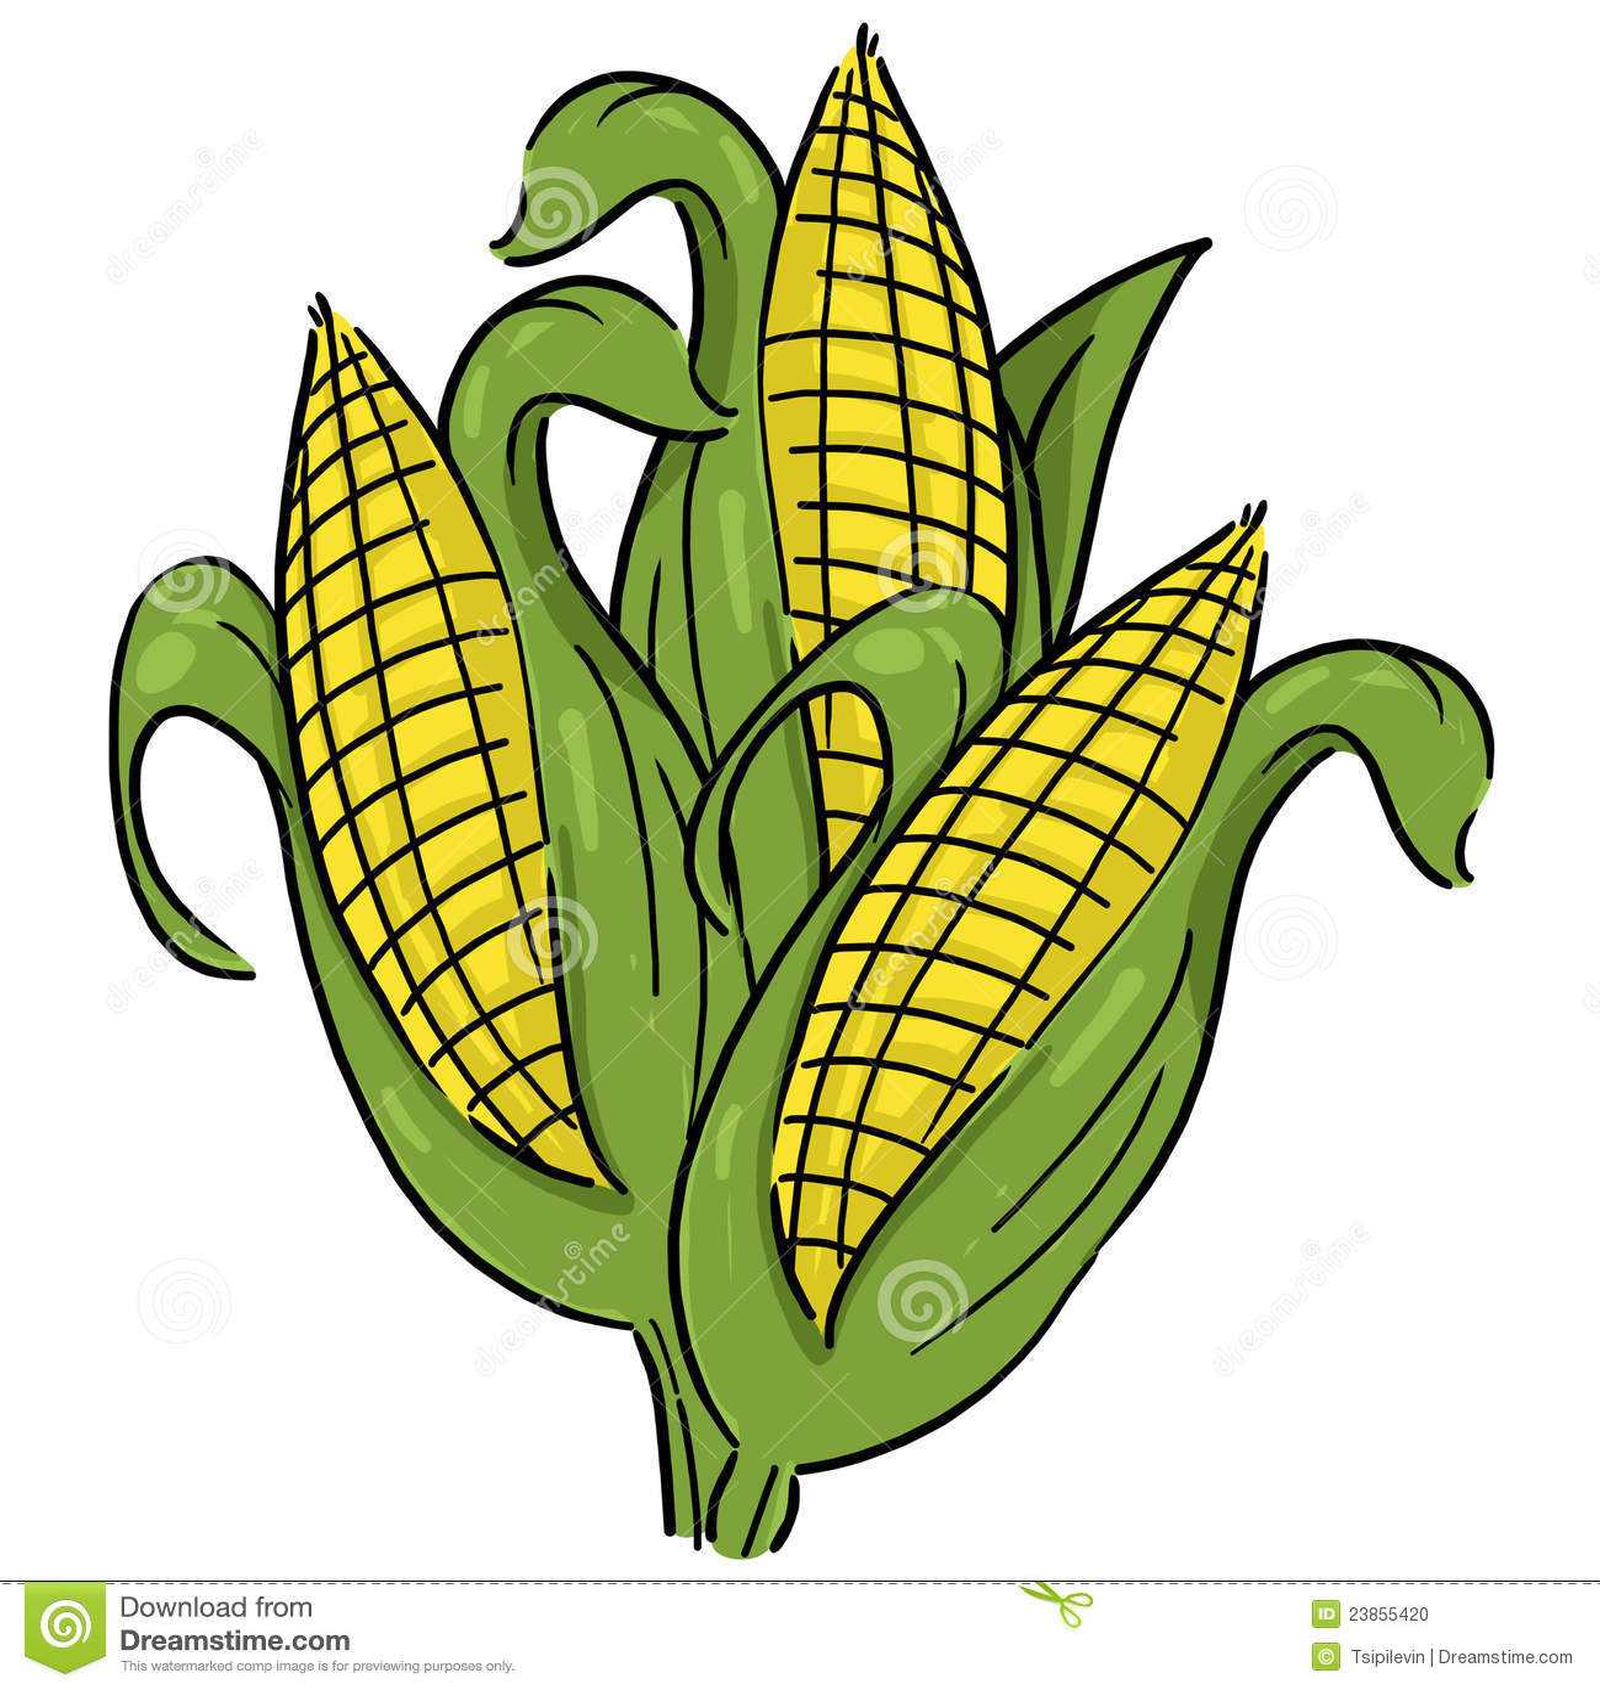 Free Fall Harvest Wallpaper Ears Of Corn Illustration Stock Illustration Illustration